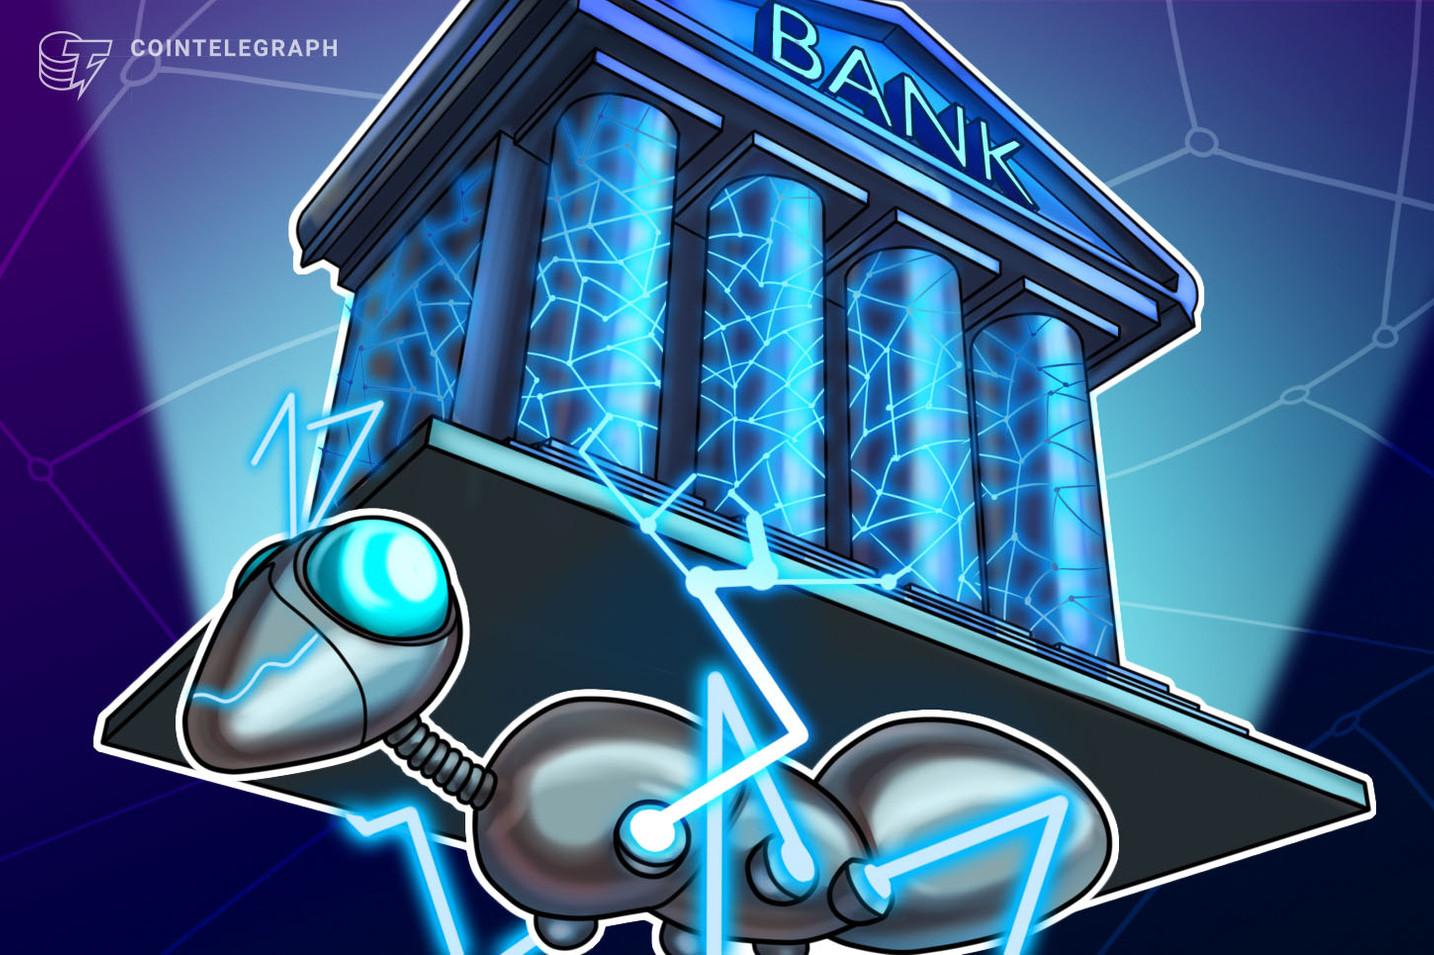 Woori becomes latest major Korean bank to announce crypto custody services